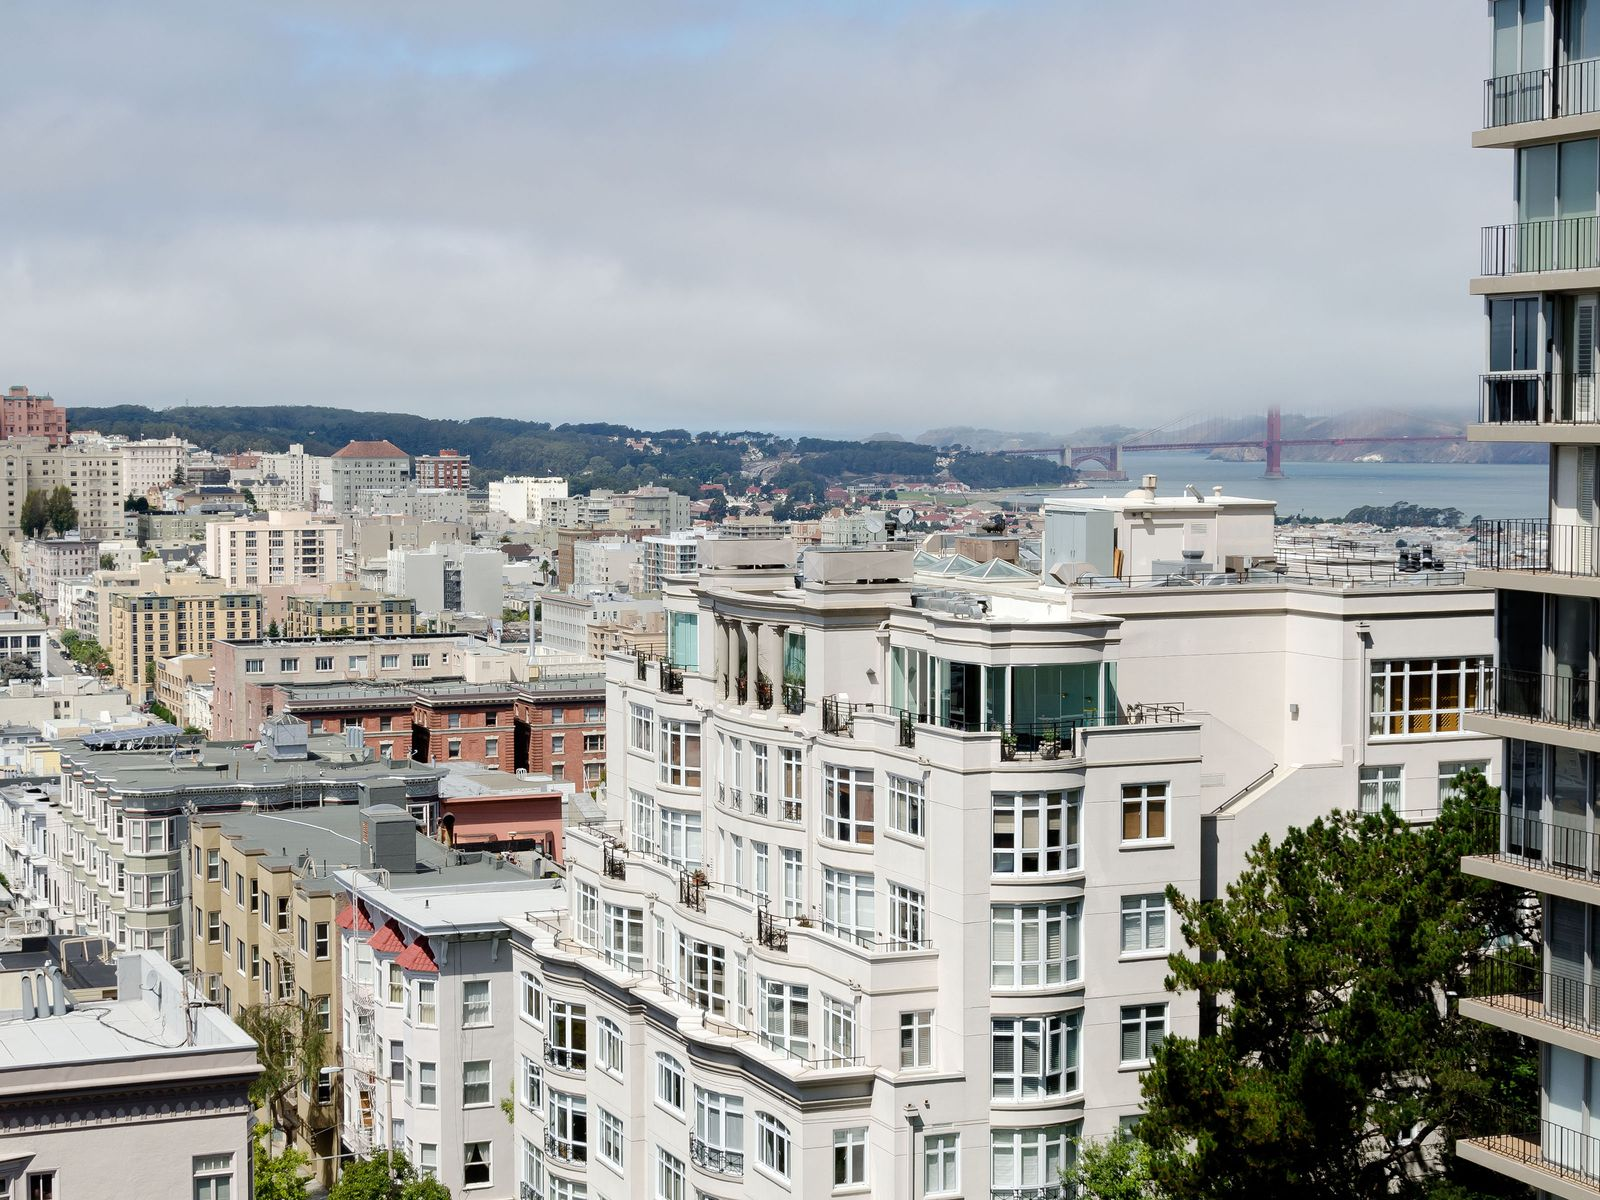 Views Atop Nob Hill